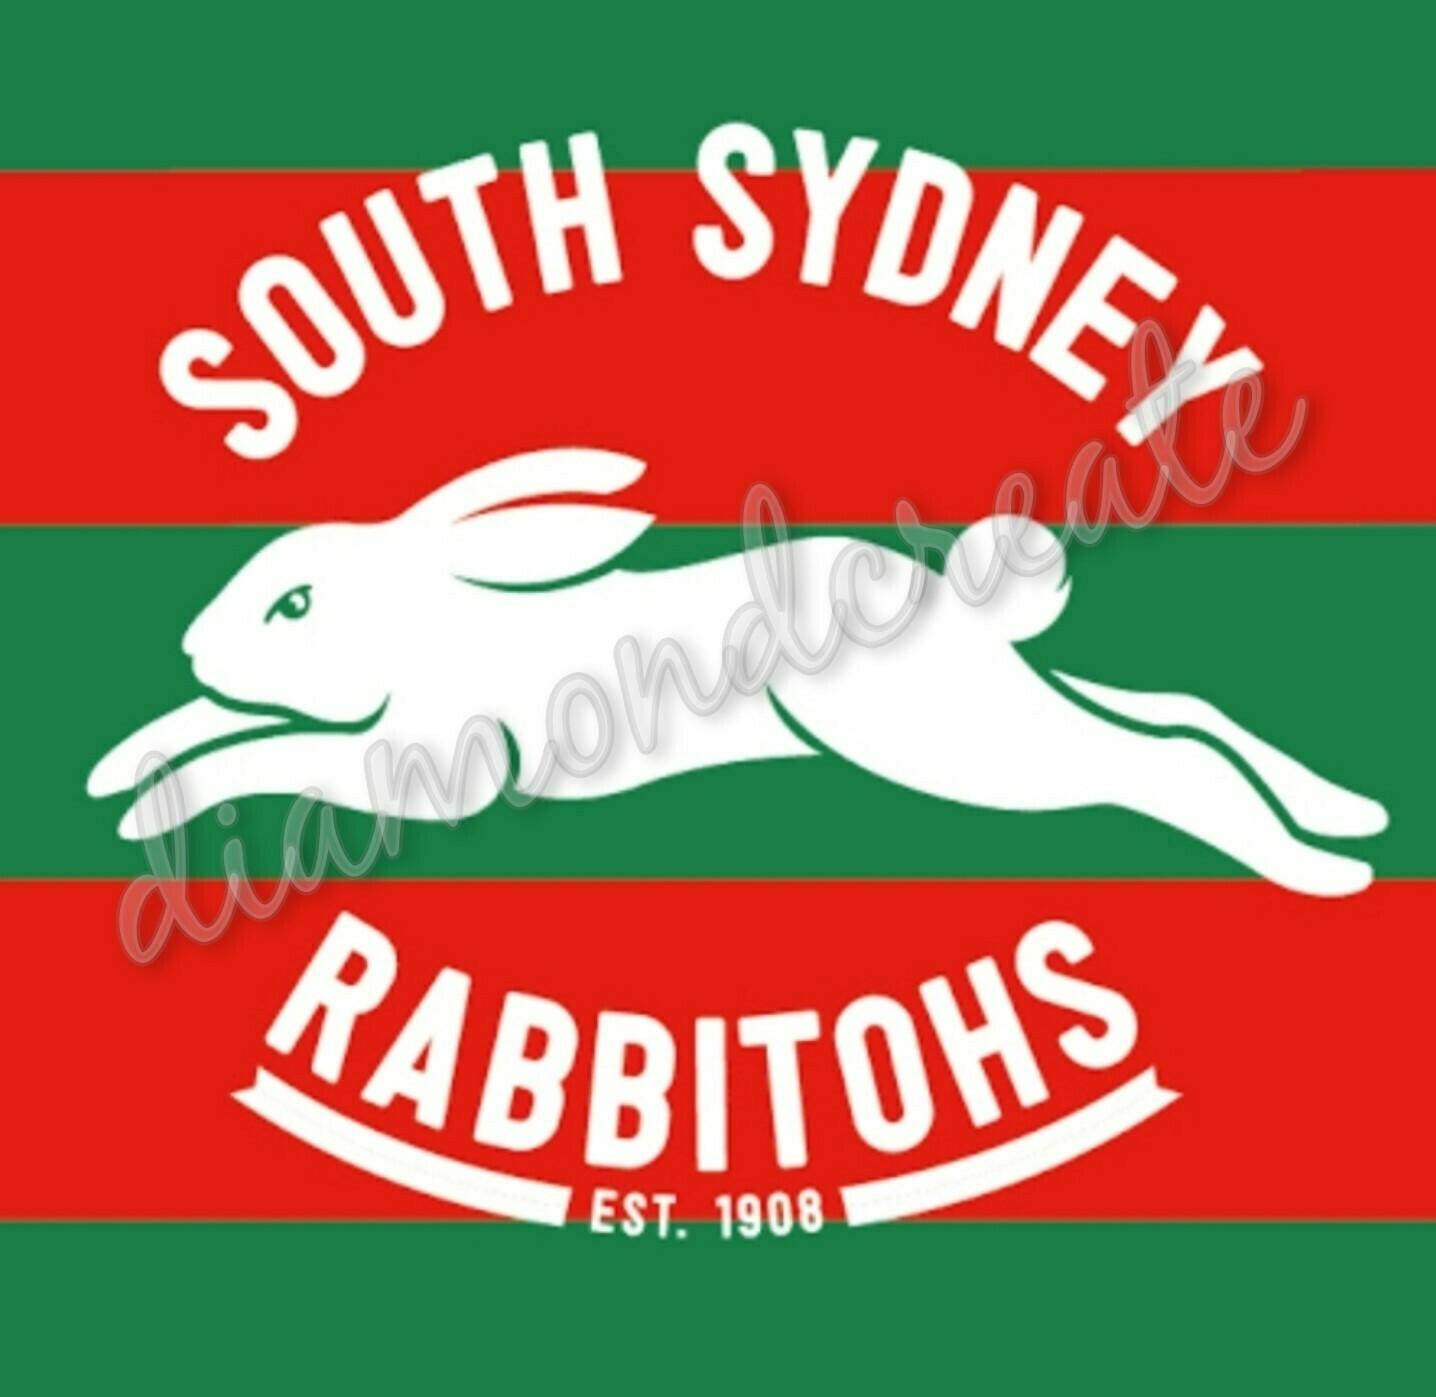 5d Diy Diamond Painting Kit In Stock South Sydney Rabbitohs 60x60cm Full Drill Square